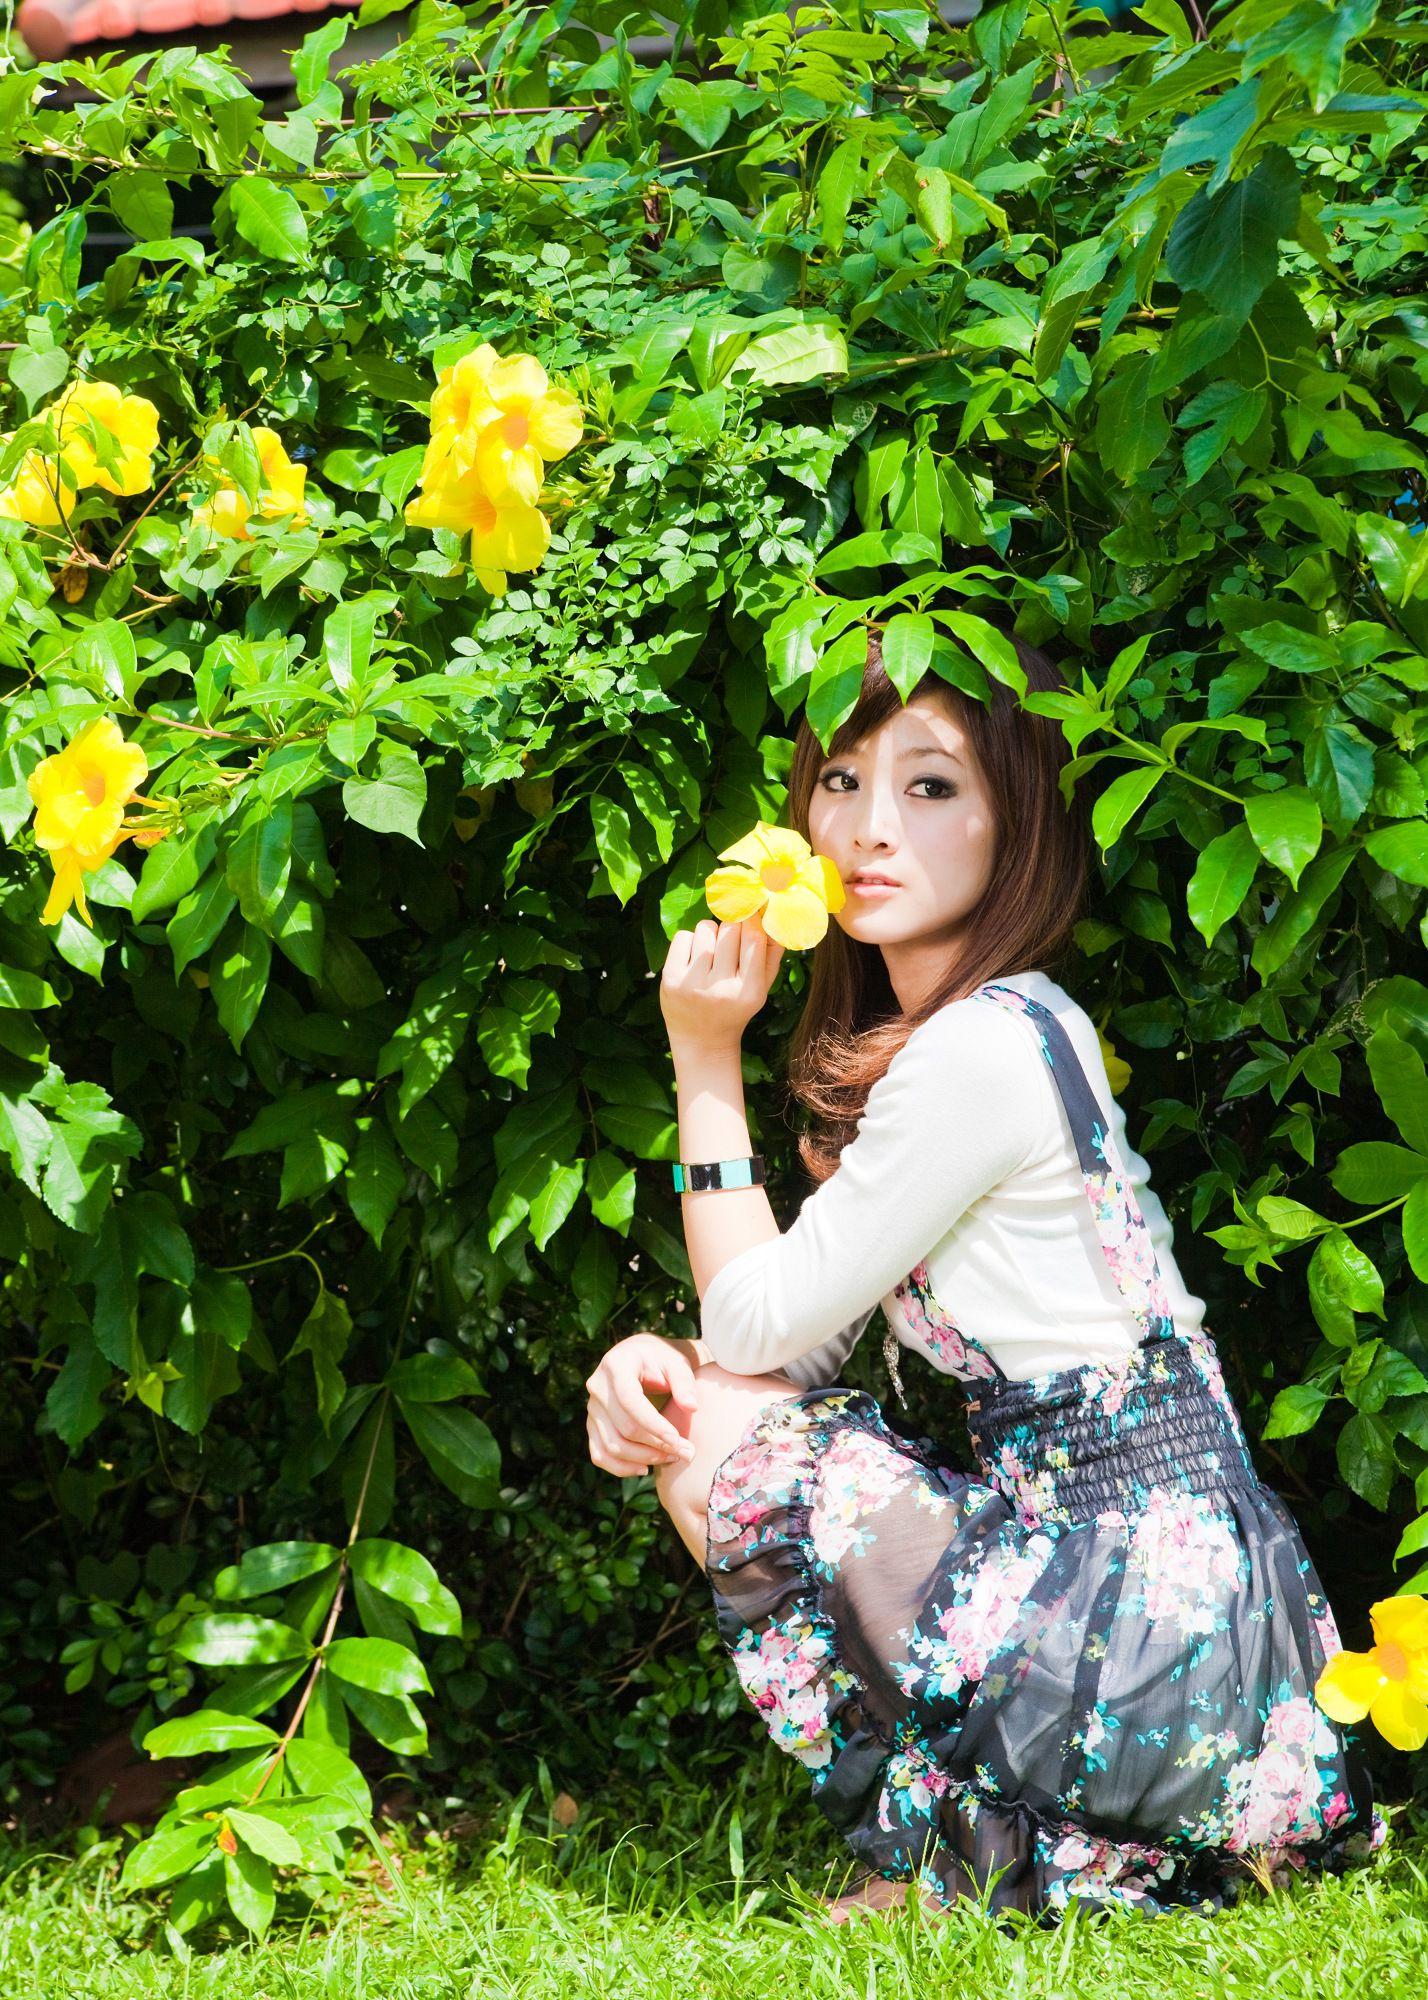 VOL.1247 [台湾正妹]清新唯美街拍正妹:张凯洁(张允霏,果子MM)高品质写真套图(113P)